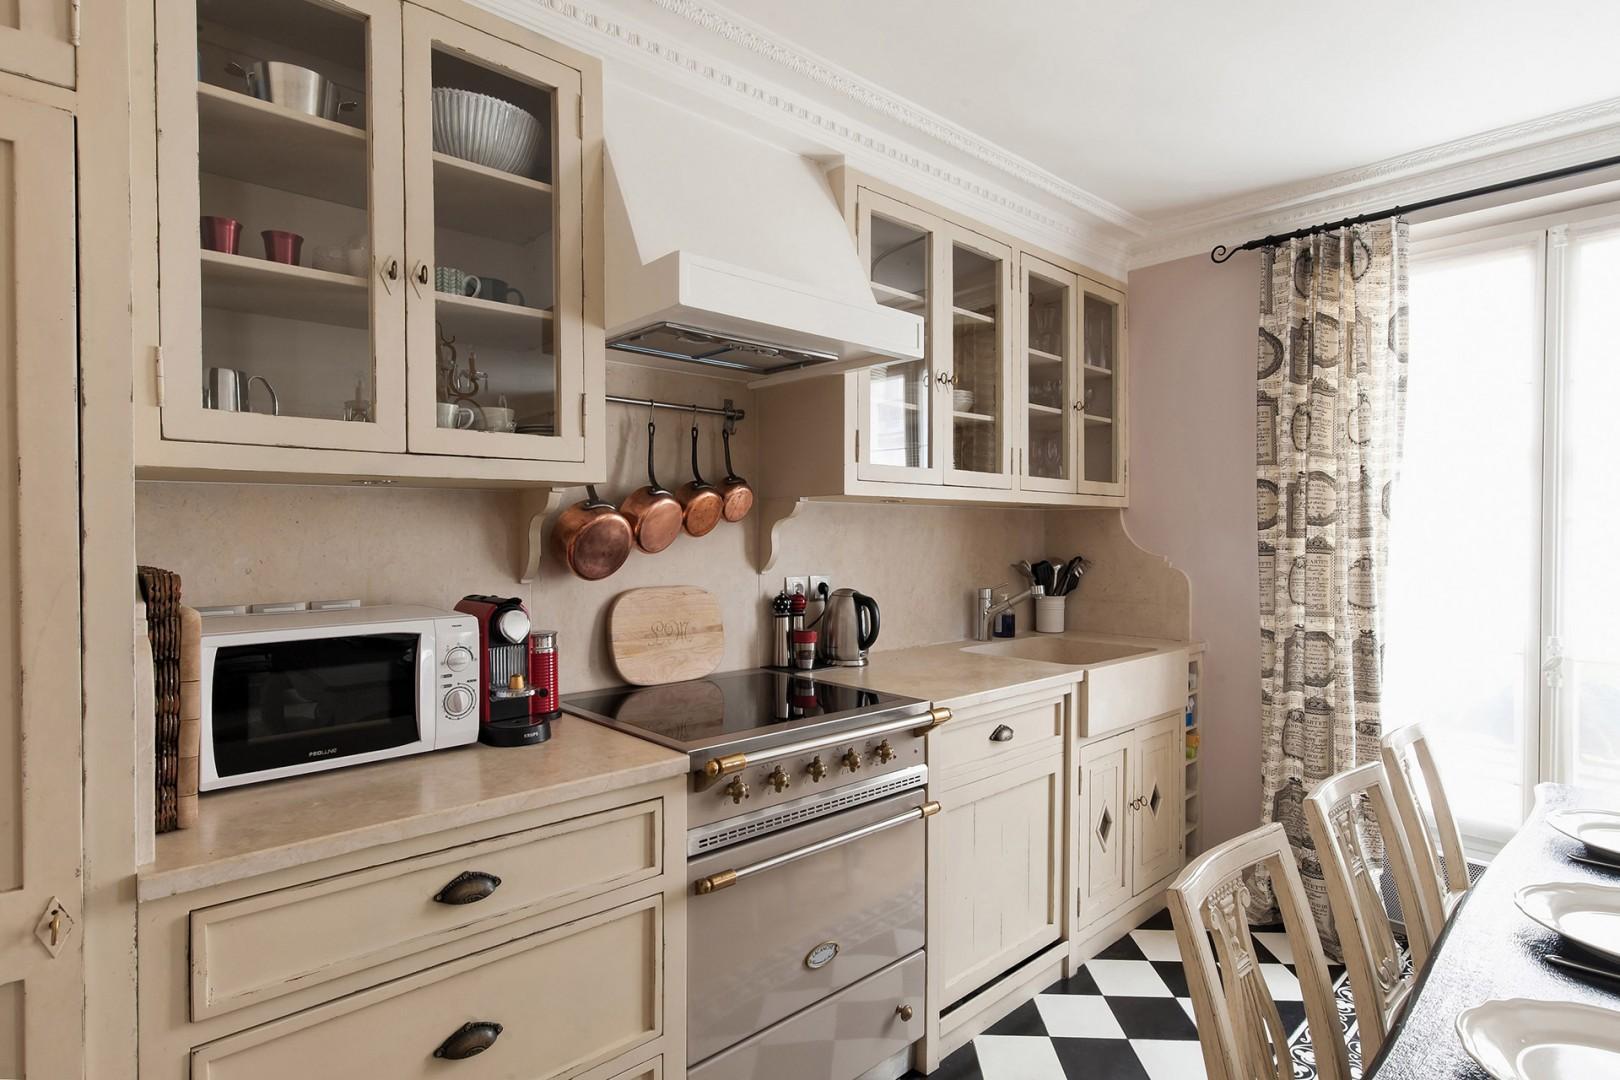 Sunlight streams into the beautiful Parisian kitchen.